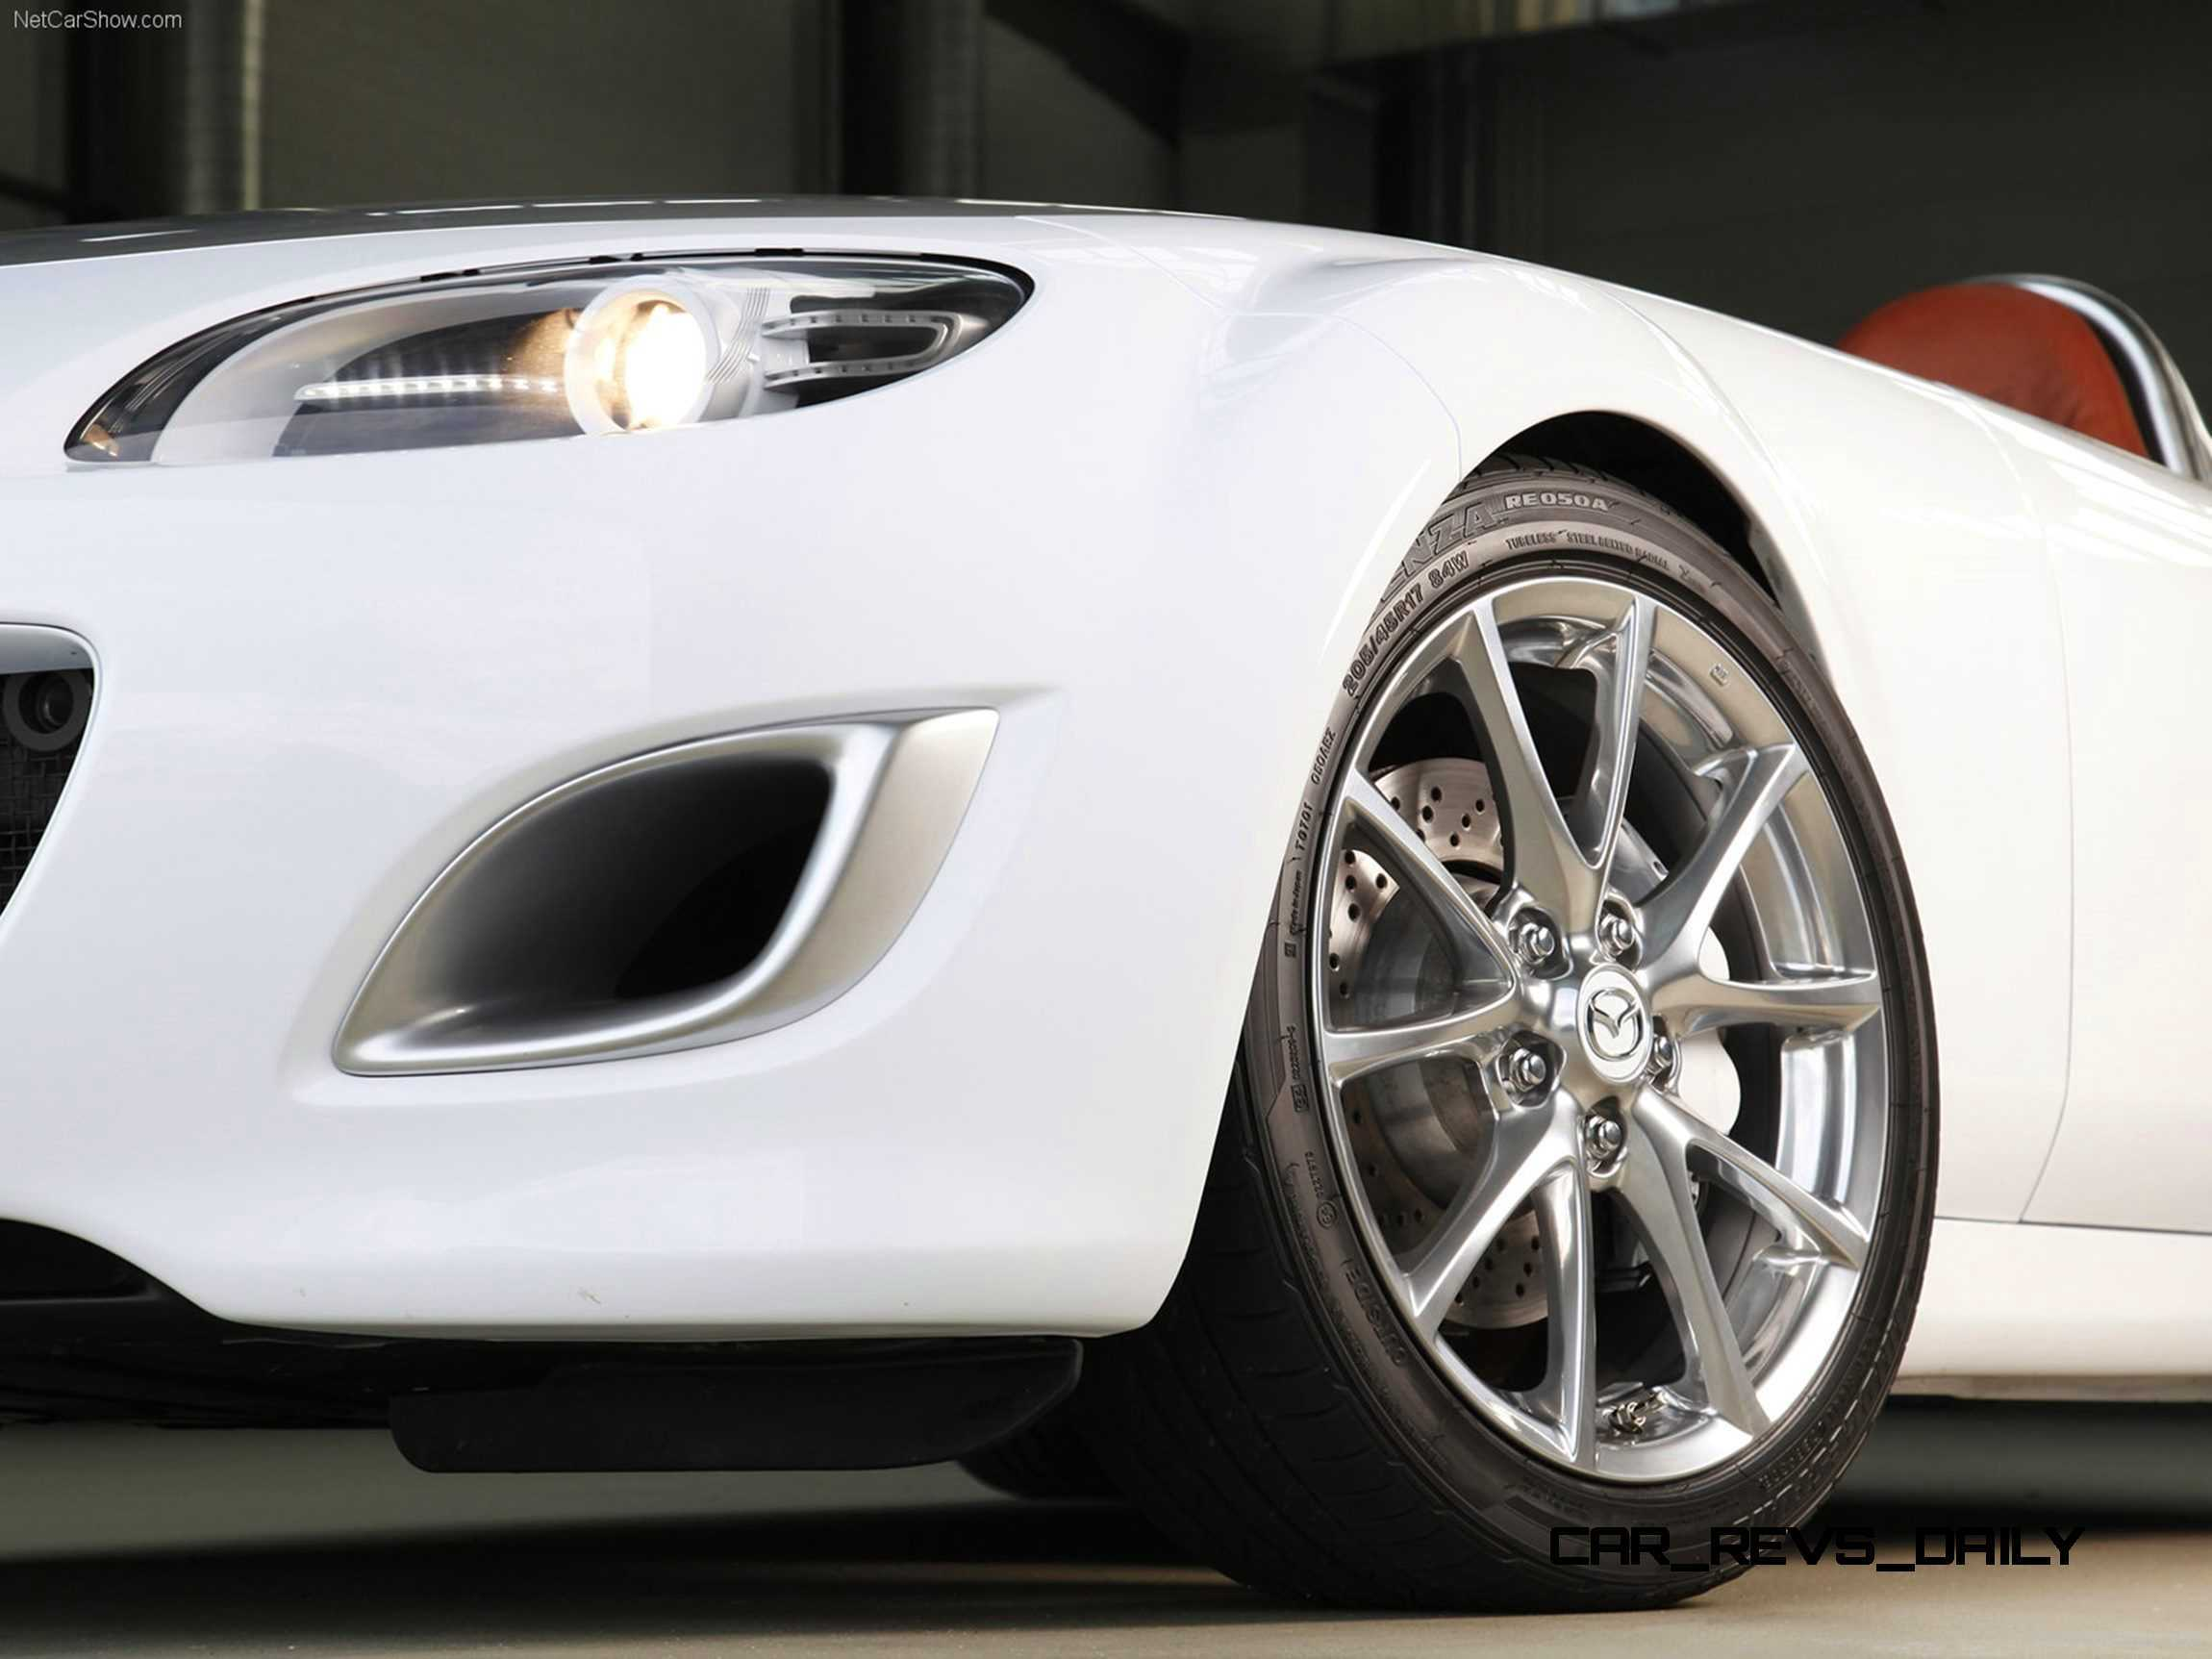 http://www.car-revs-daily.com/wp-content/uploads/2015/05/Mazda-MX-5_Superlight_Concept_2009_1600x1200_wallpaper_31.jpg